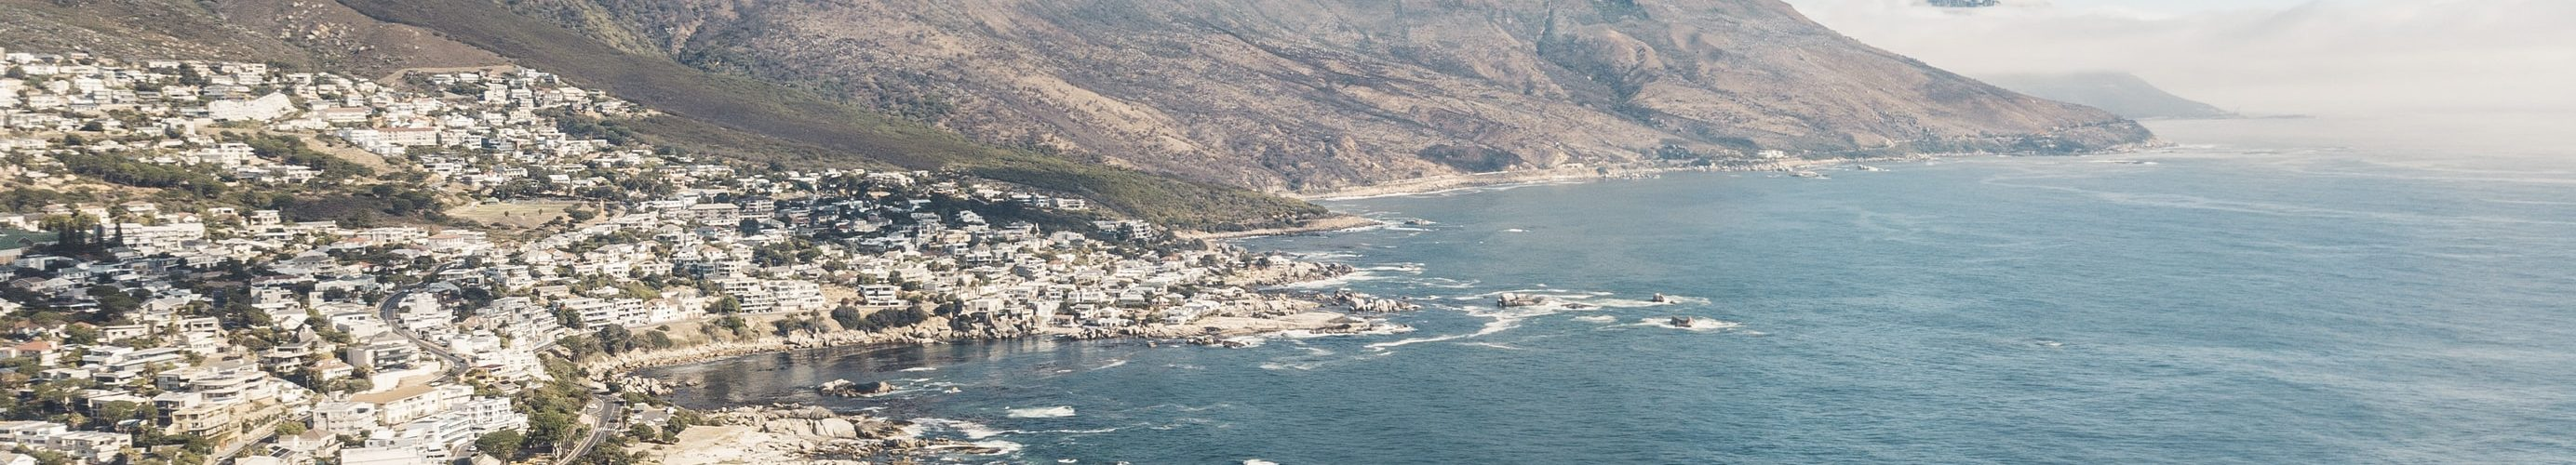 zuid-afrika-kust